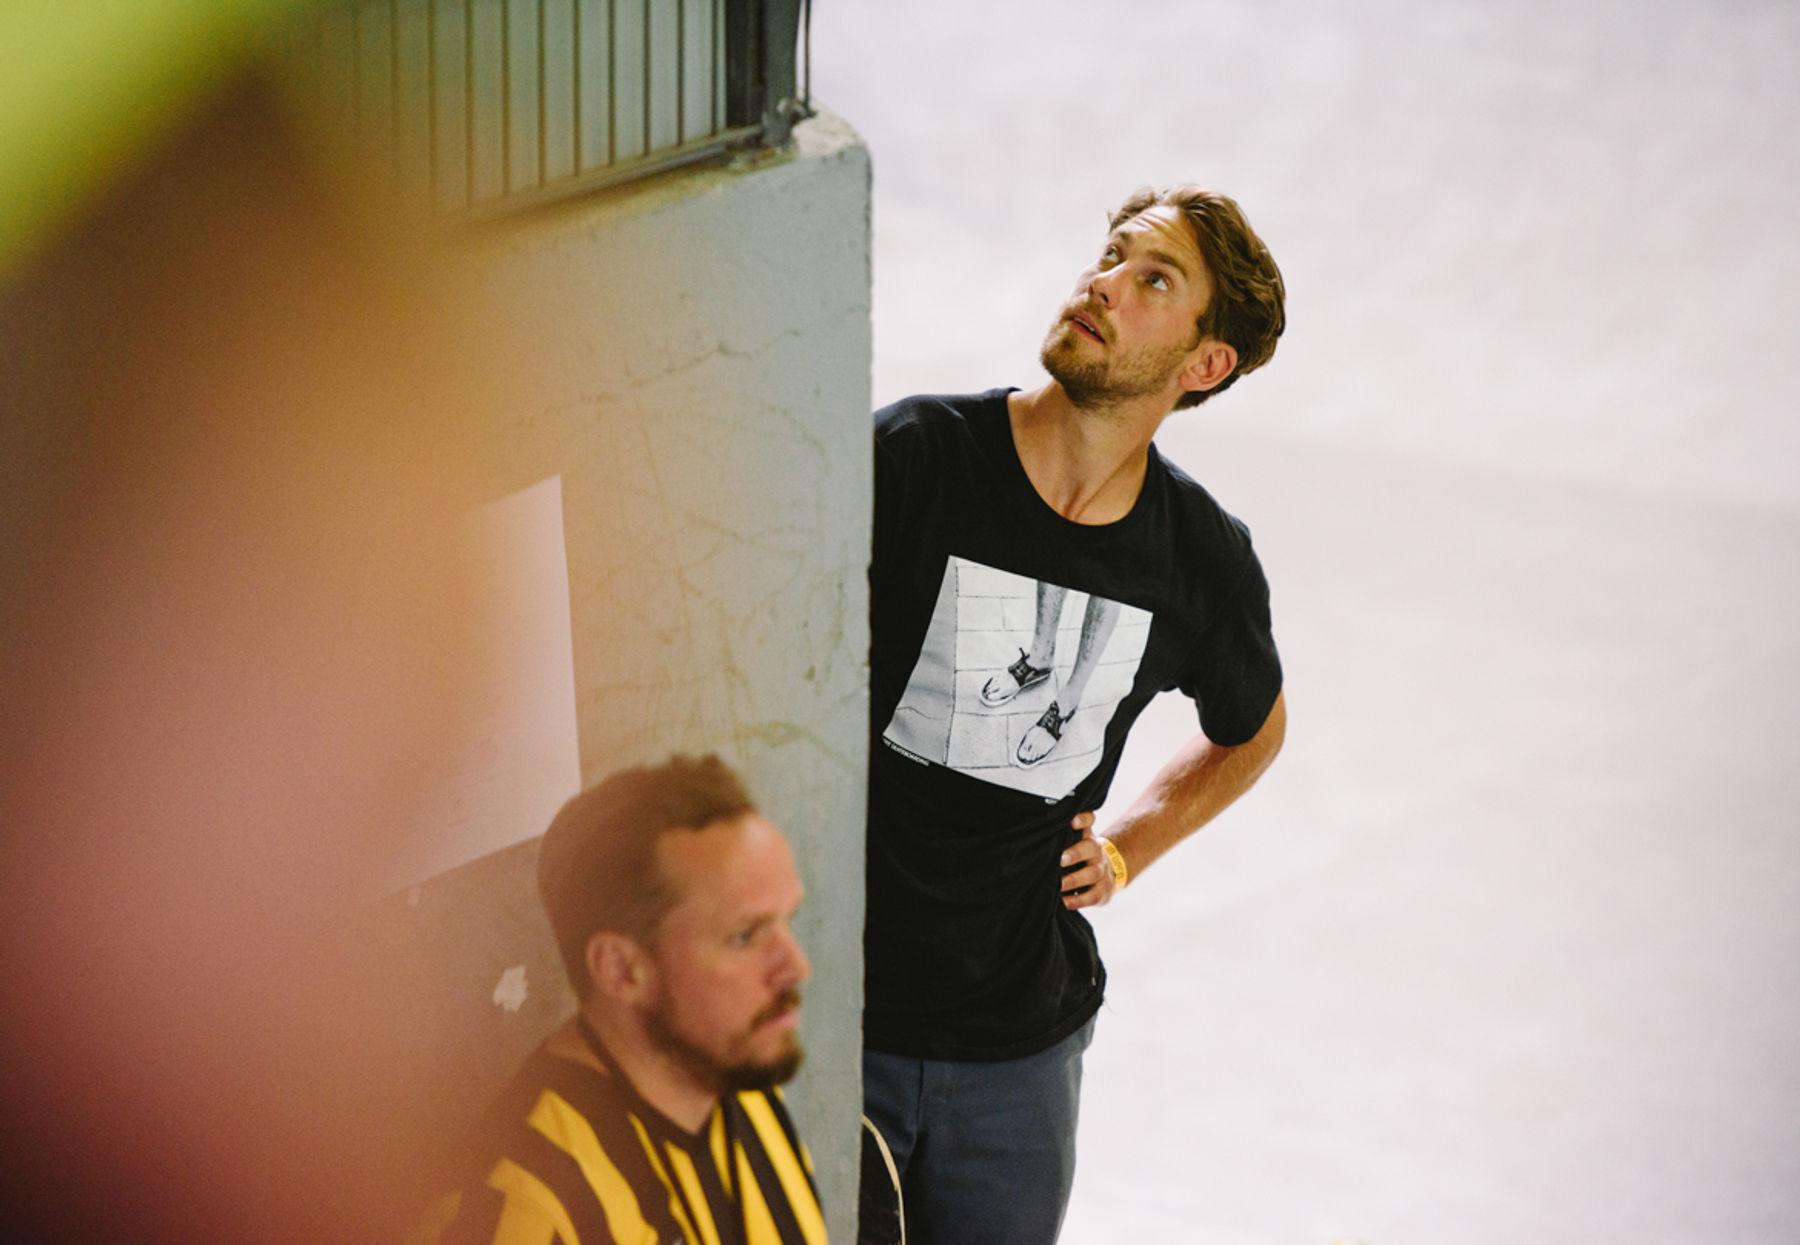 _IHC1477-Chris-Jones-Nike-SB-Berlin-Open-Day-1-July-2015-Photographer-Maksim-Kalanep